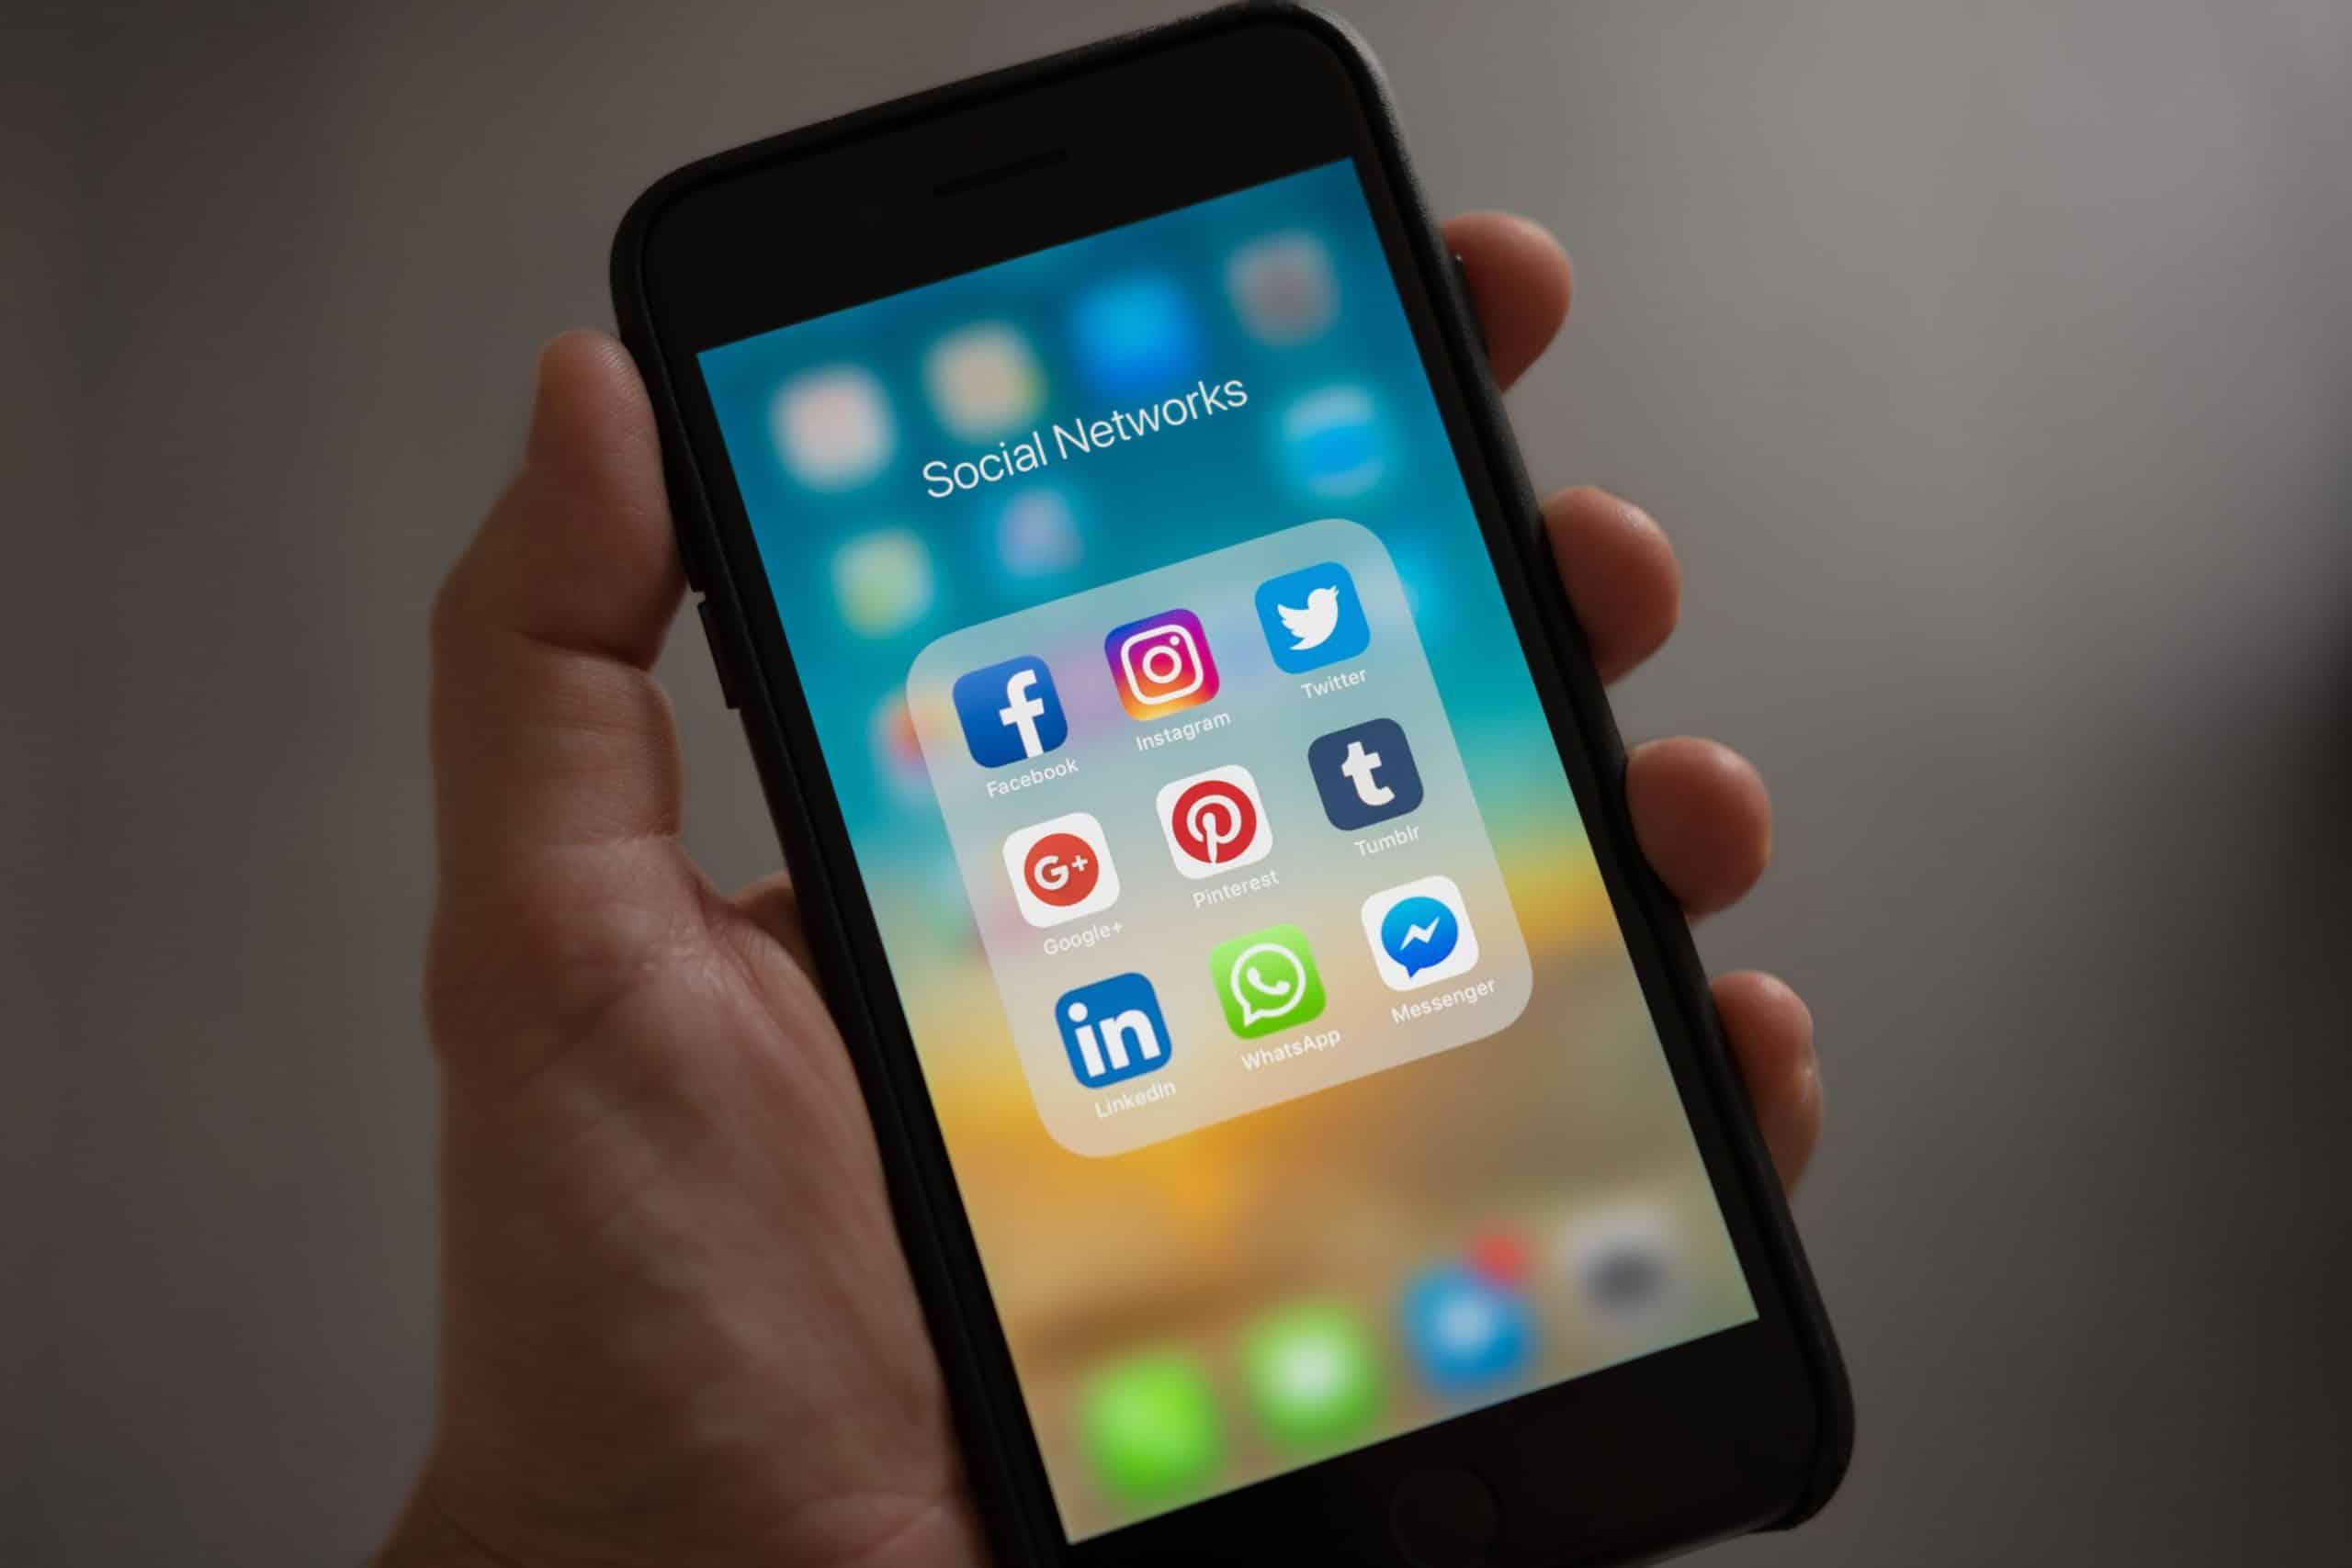 smartphone depicting social media apps.